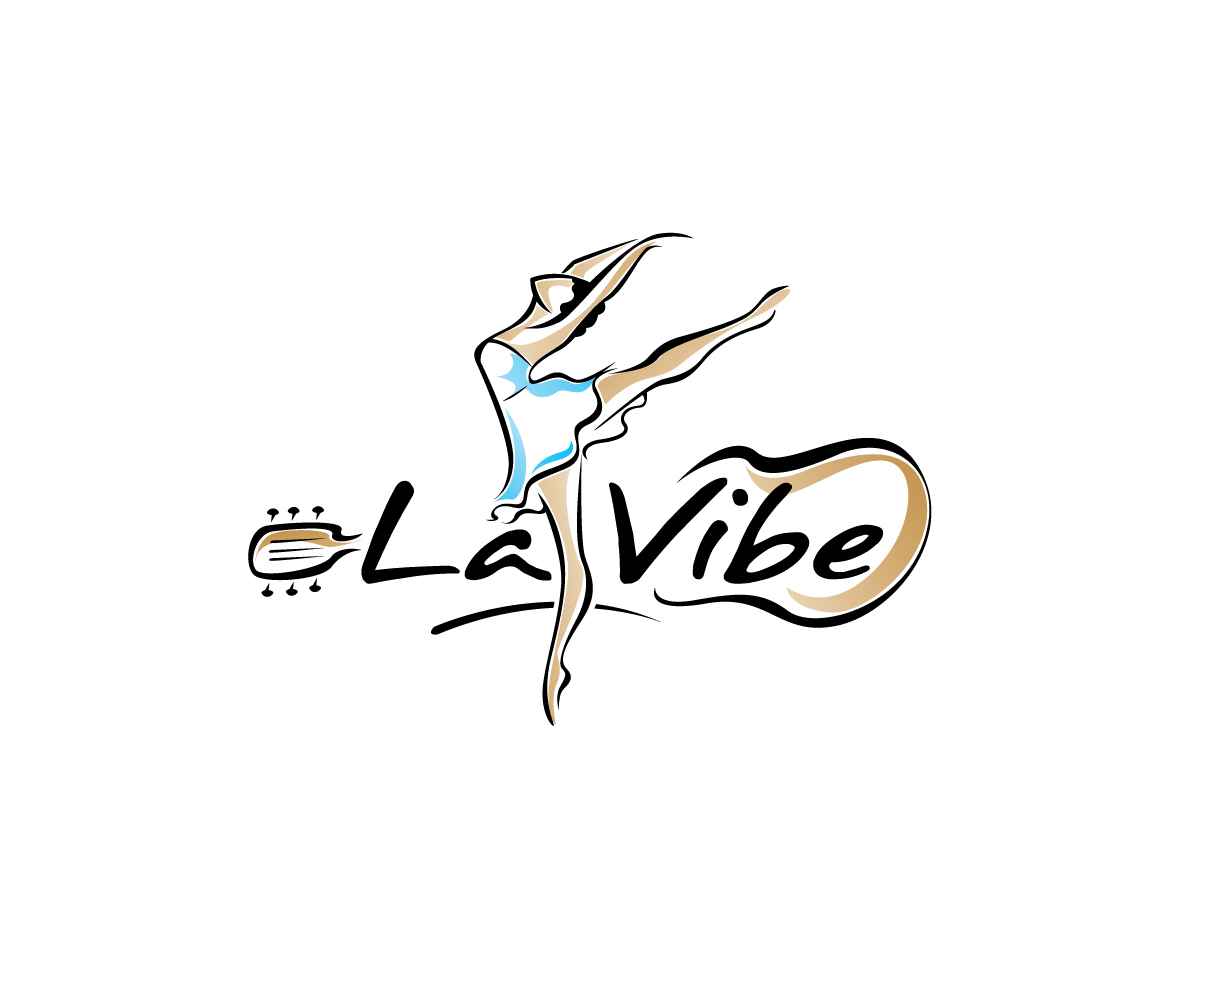 La Vibe Logo Design by Graphicsexpert